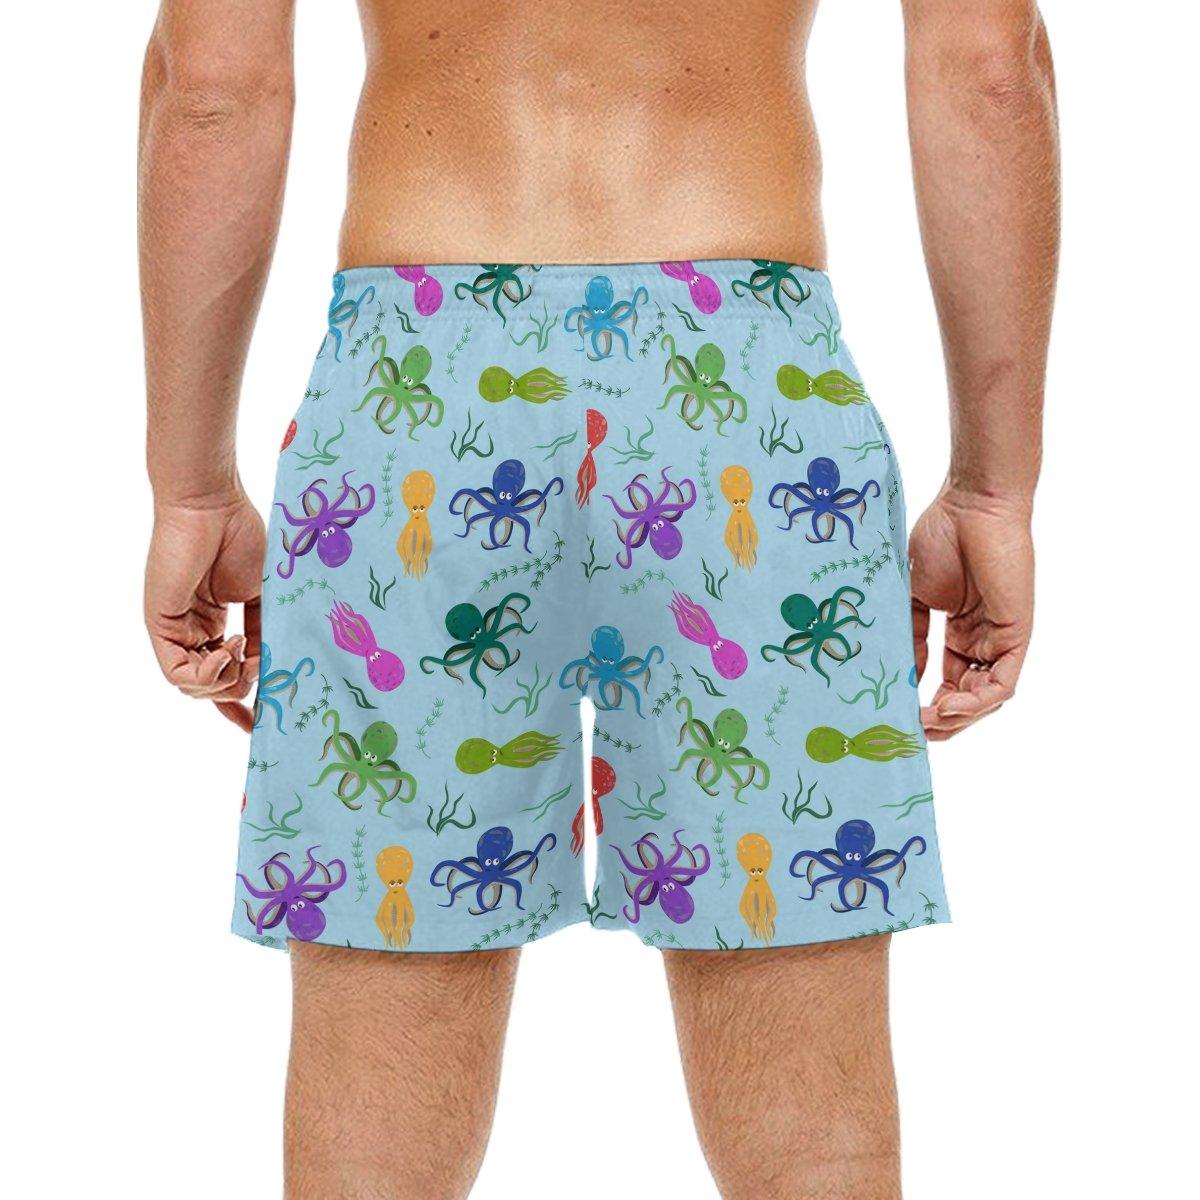 LORVIES Mens Octopus Pattern Beach Board Shorts Quick Dry Swim Trunk